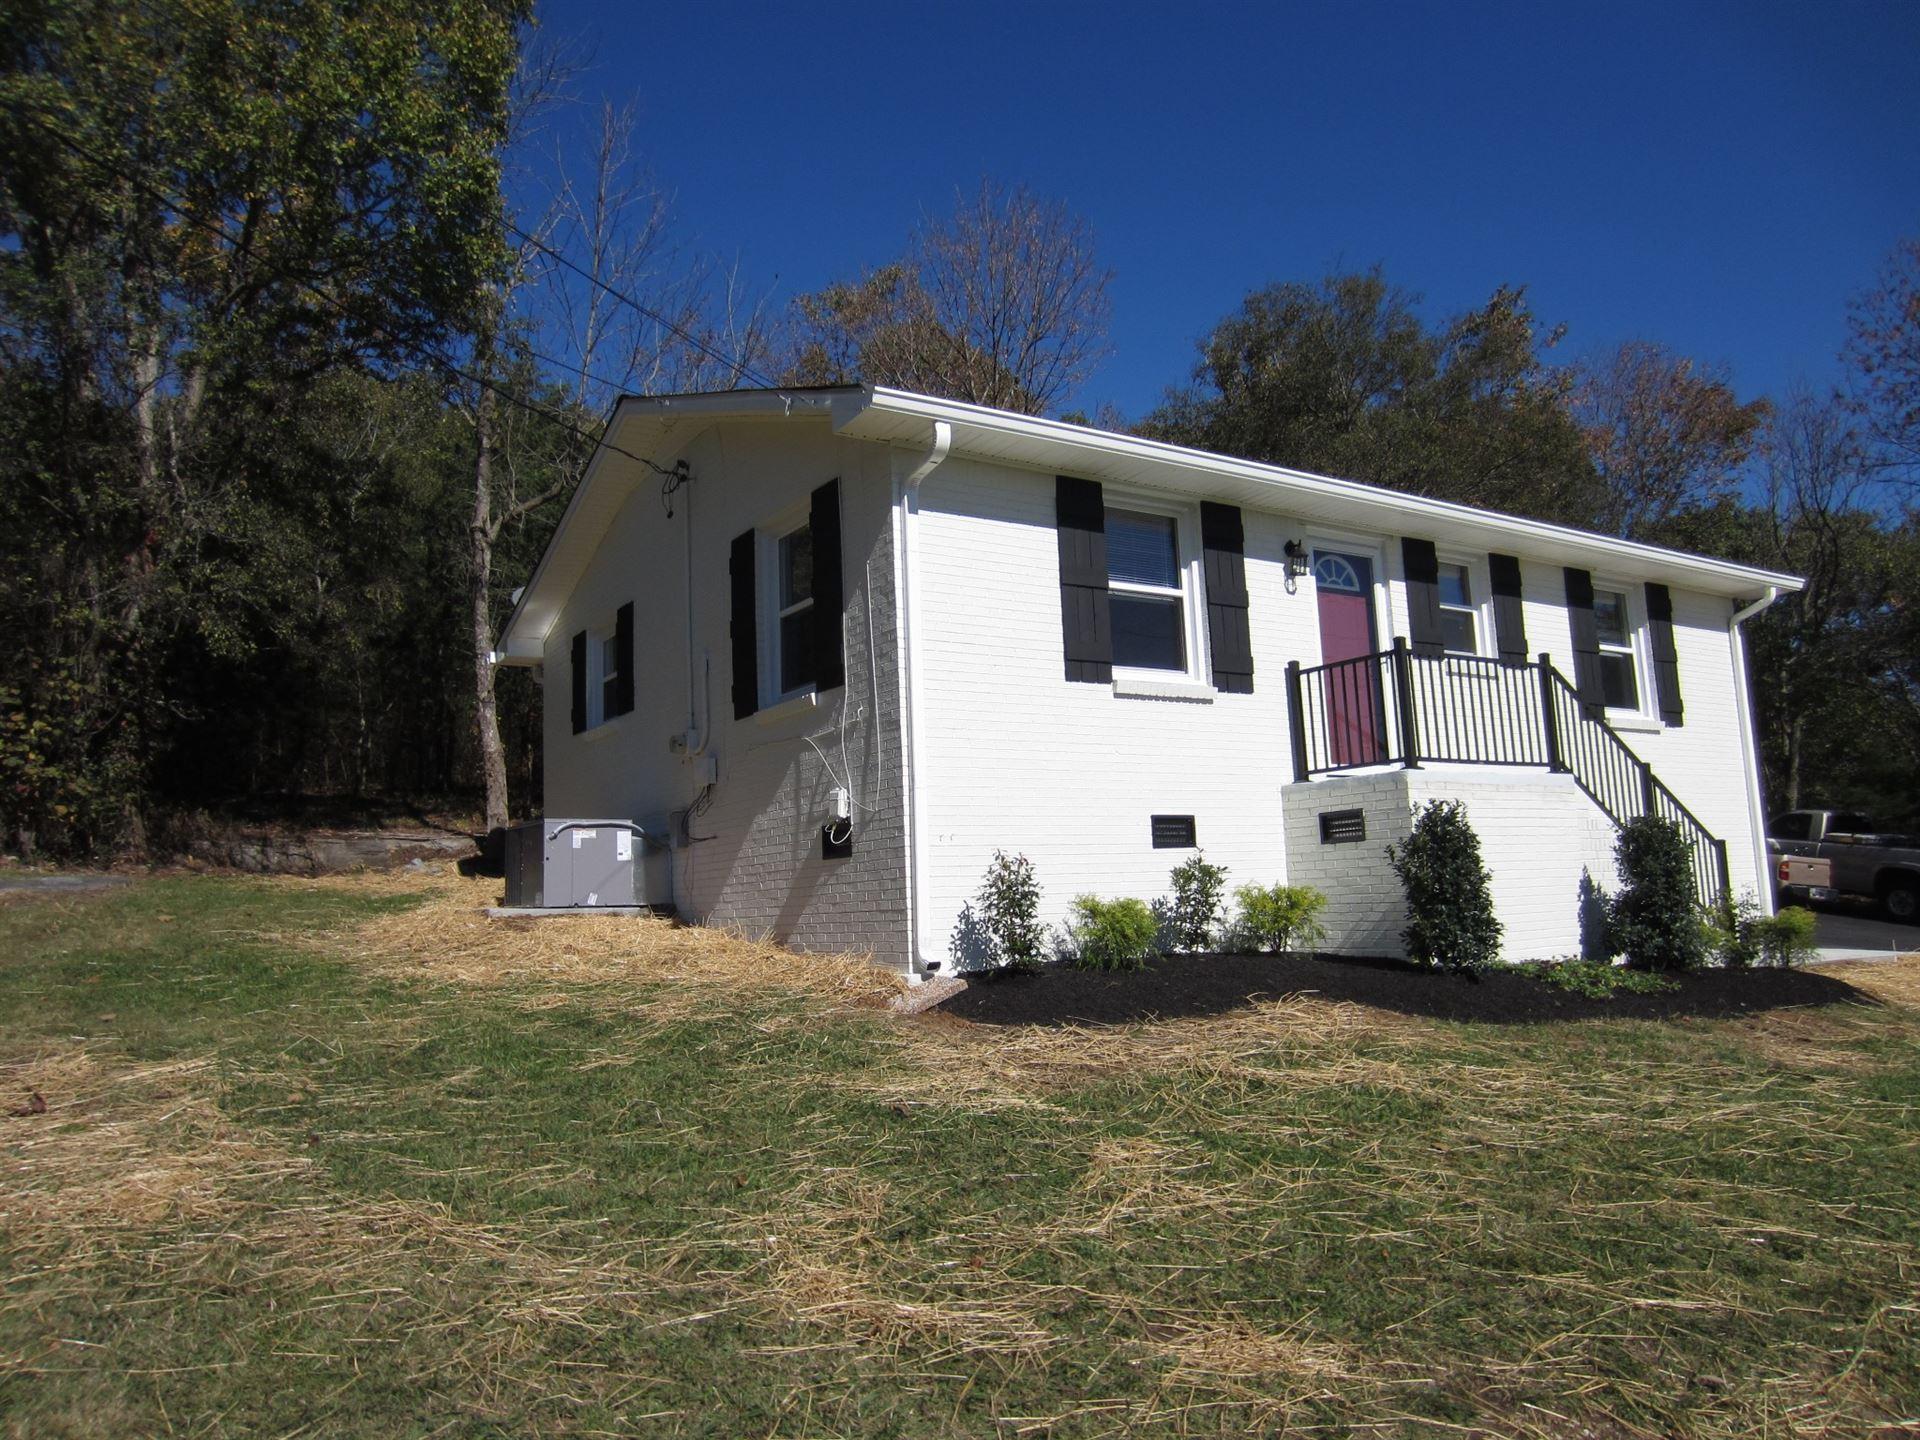 Photo of 7533 Sparta Pike, Watertown, TN 37184 (MLS # 2303656)